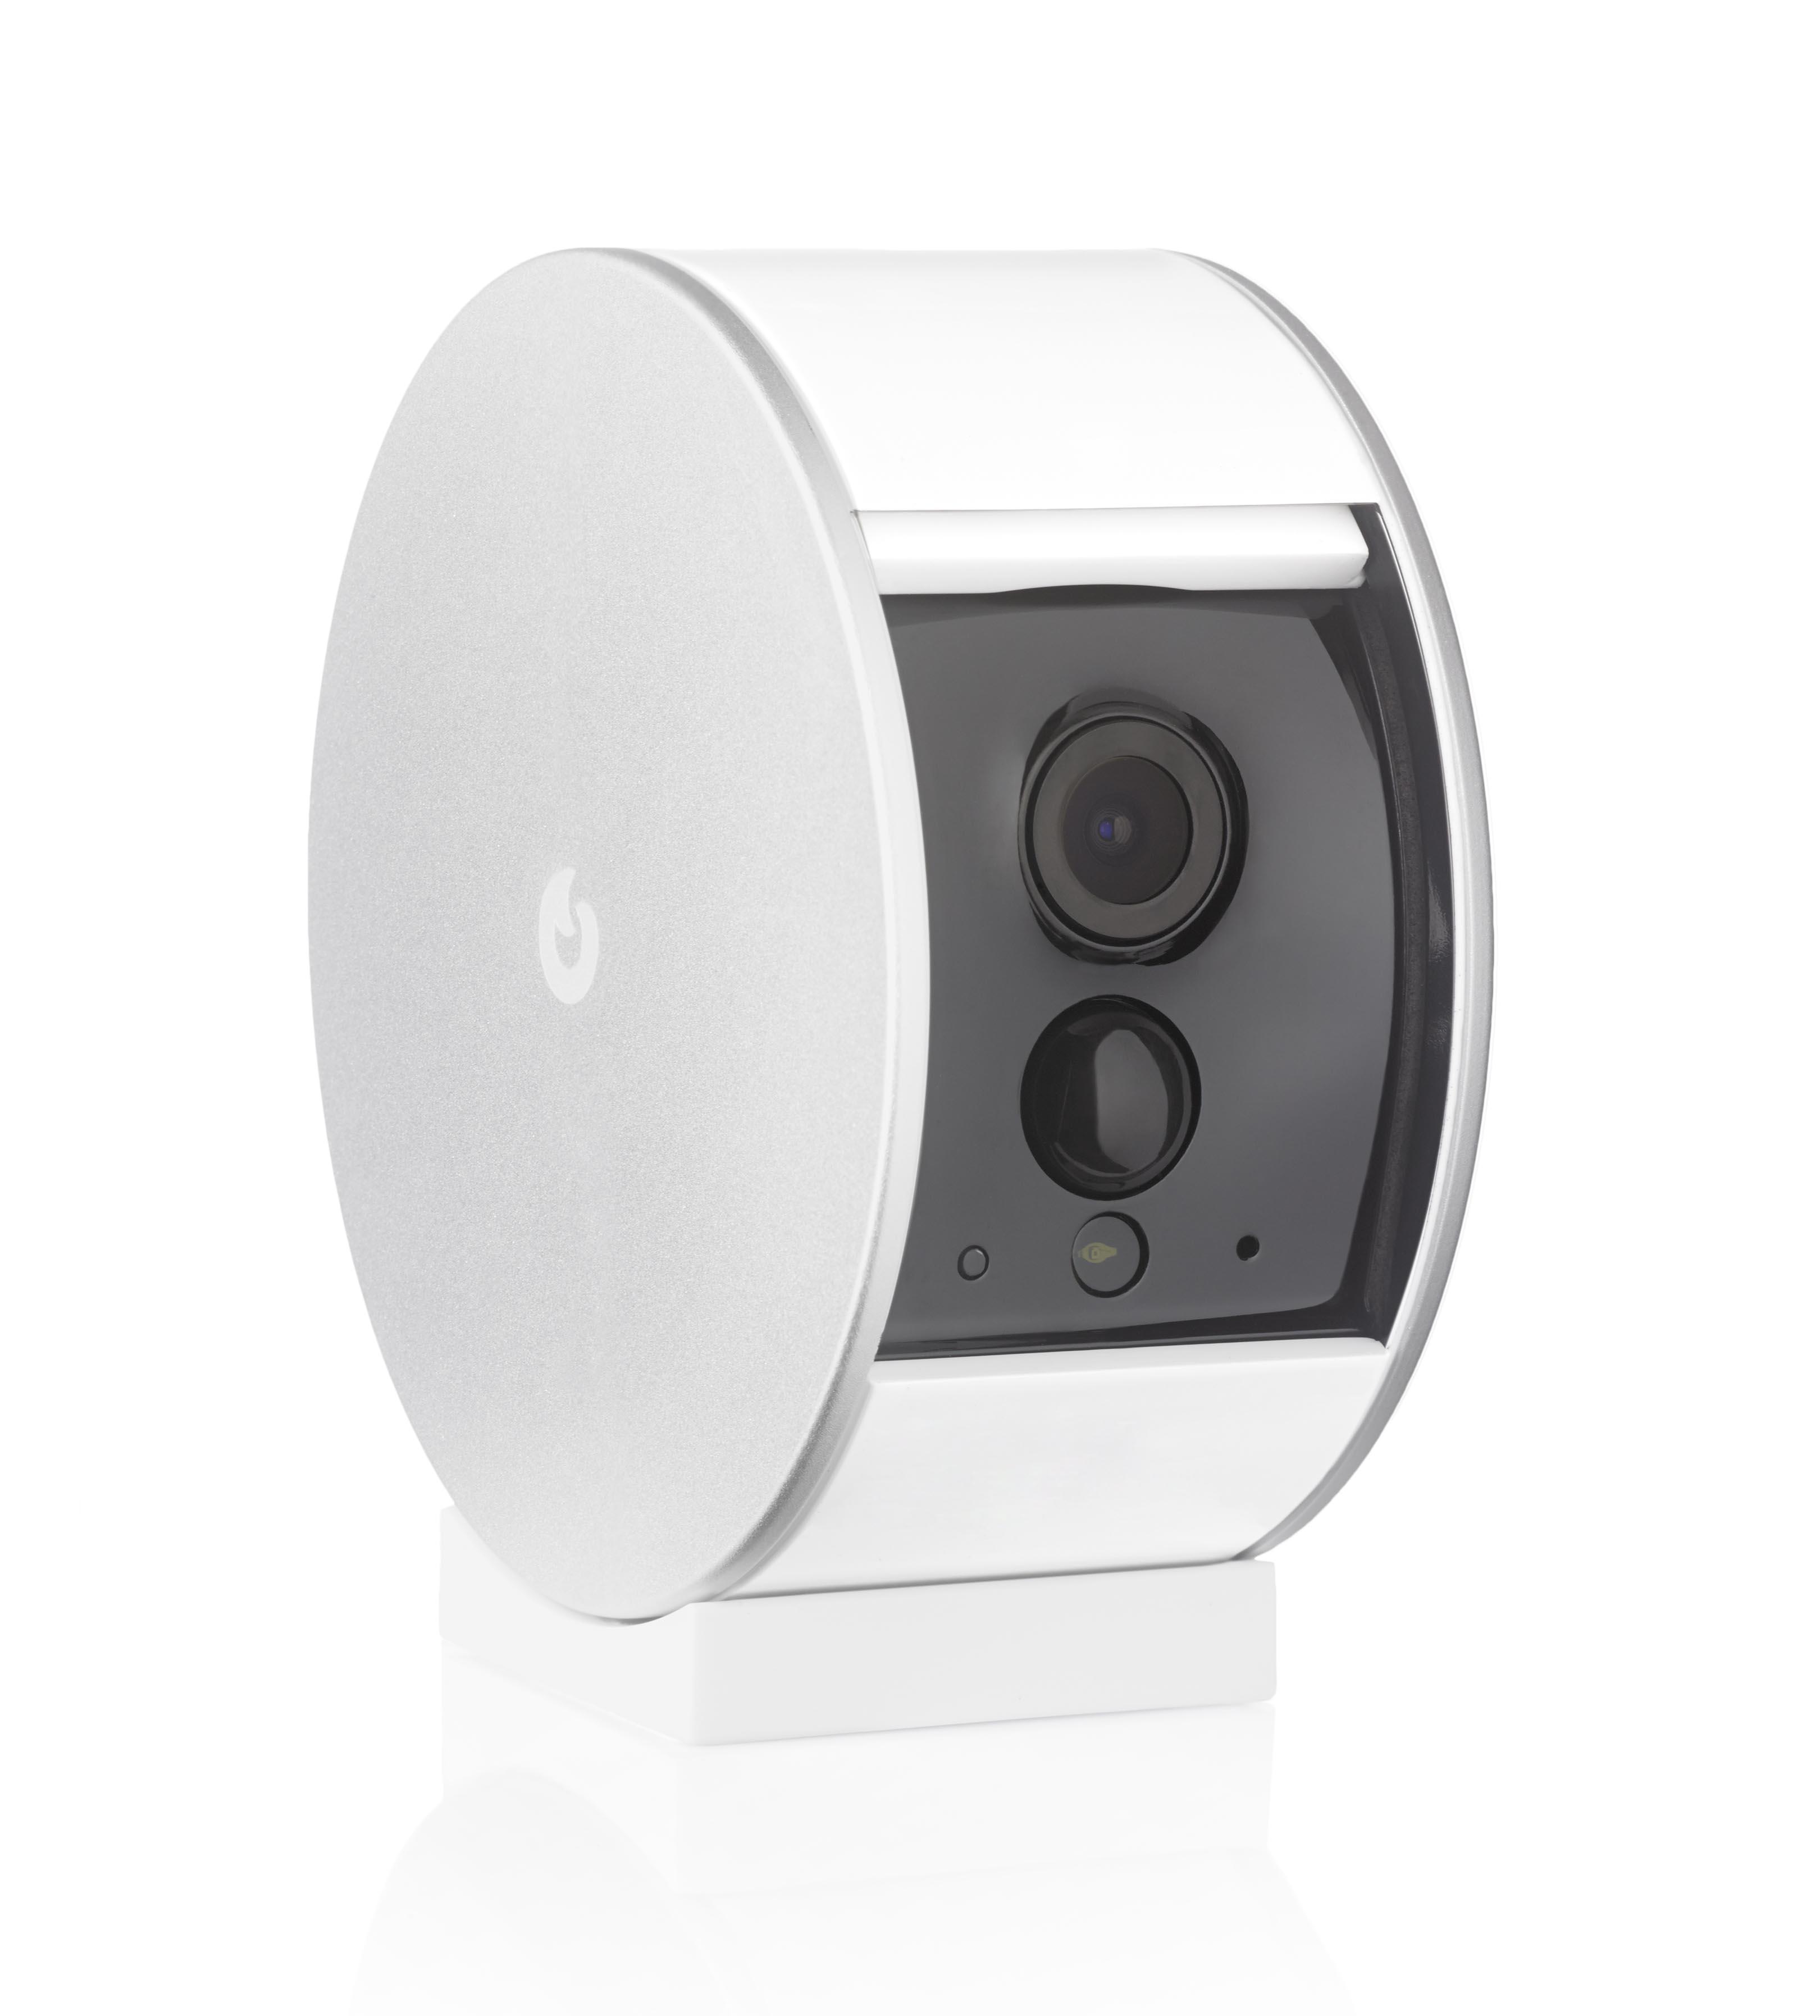 Myfox Security Camera 1